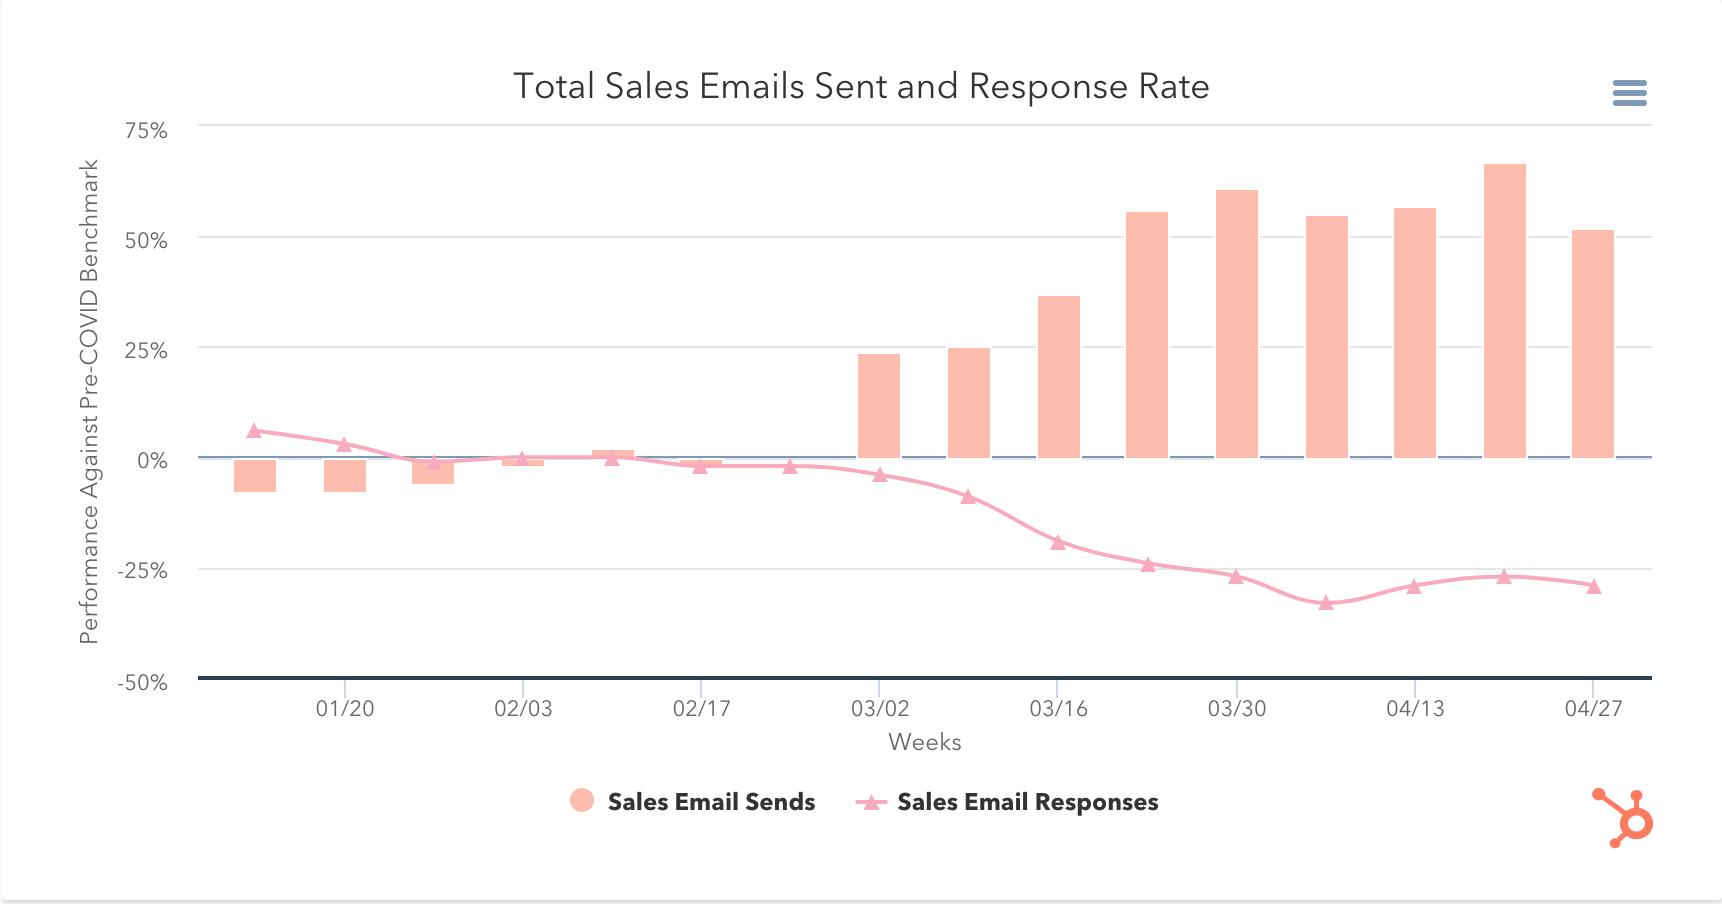 impact of coronavirus on sales emails